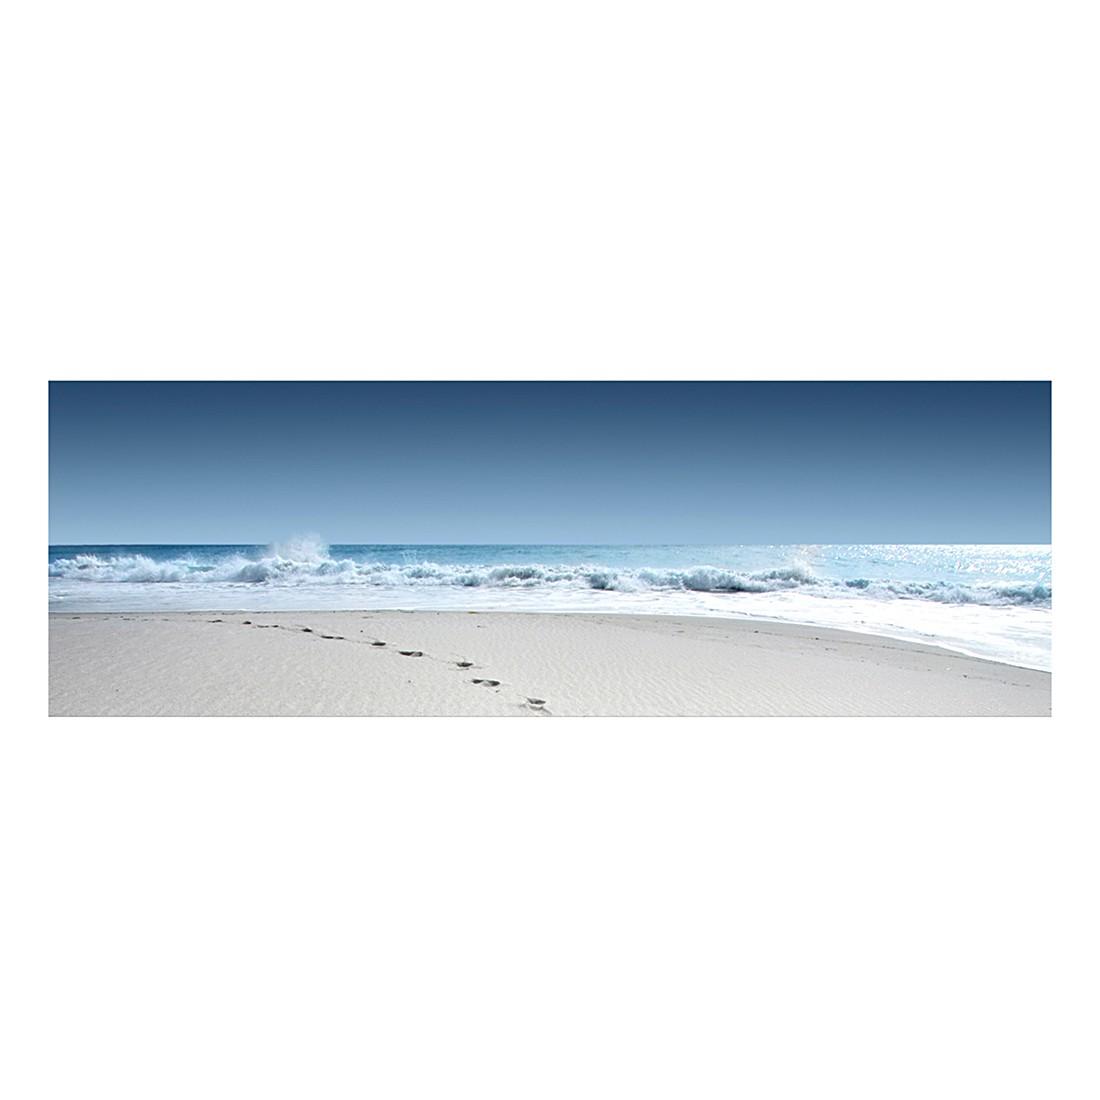 Leinwandbild Spuren im Sand, Mantiburi jetzt bestellen